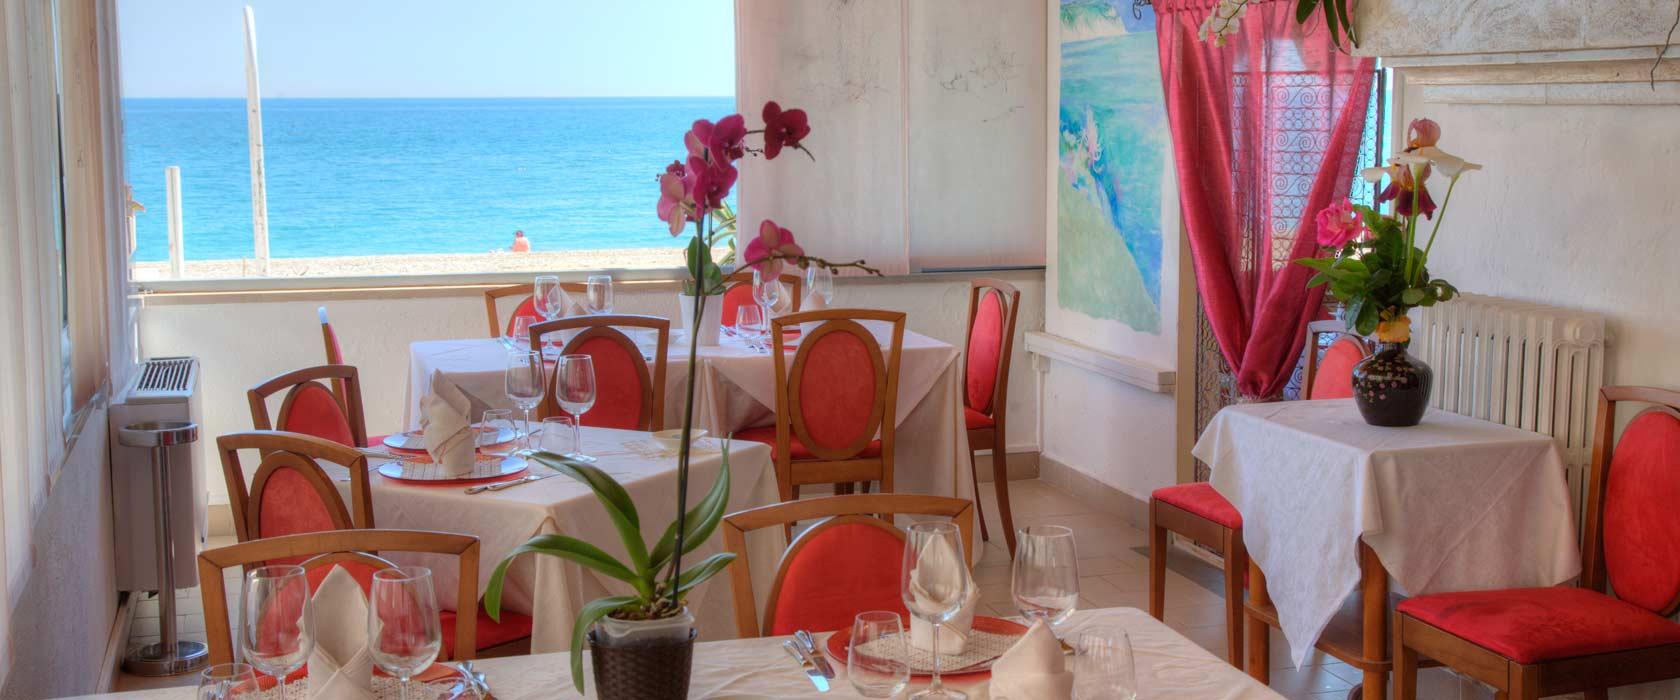 ristorante-numana_003